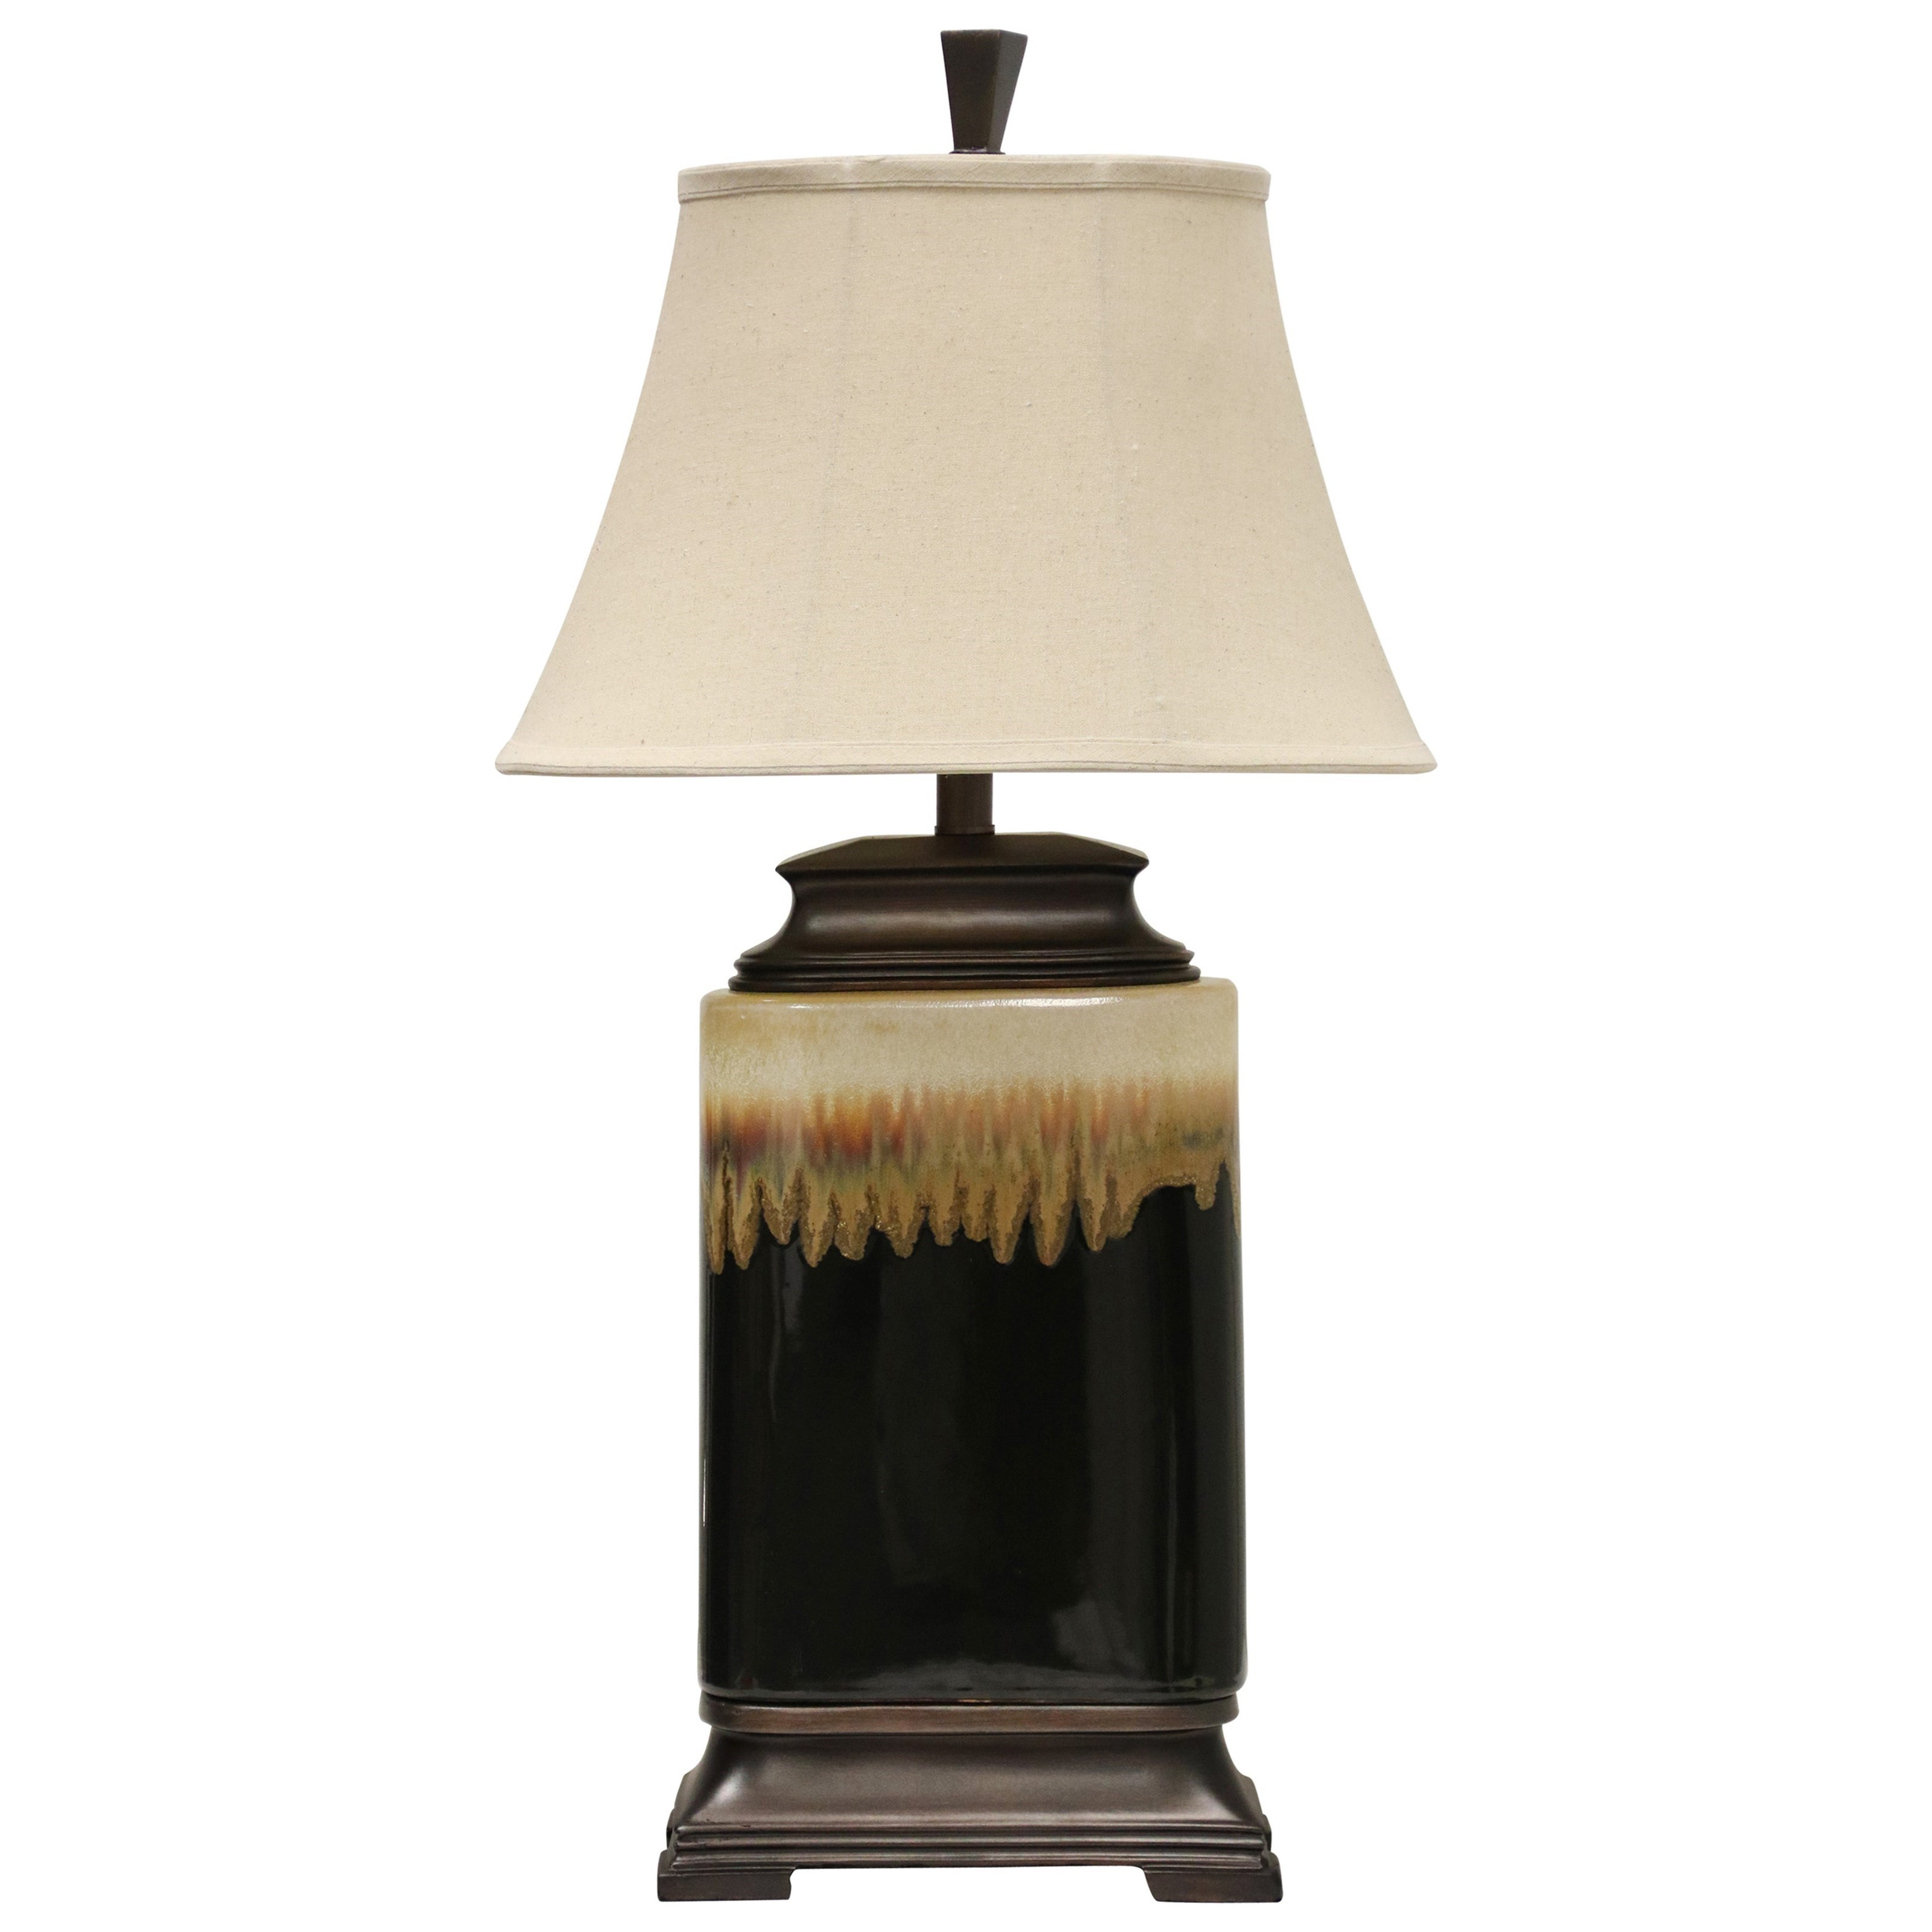 Lamps Ceramic Table Lamp at Ruby Gordon Home